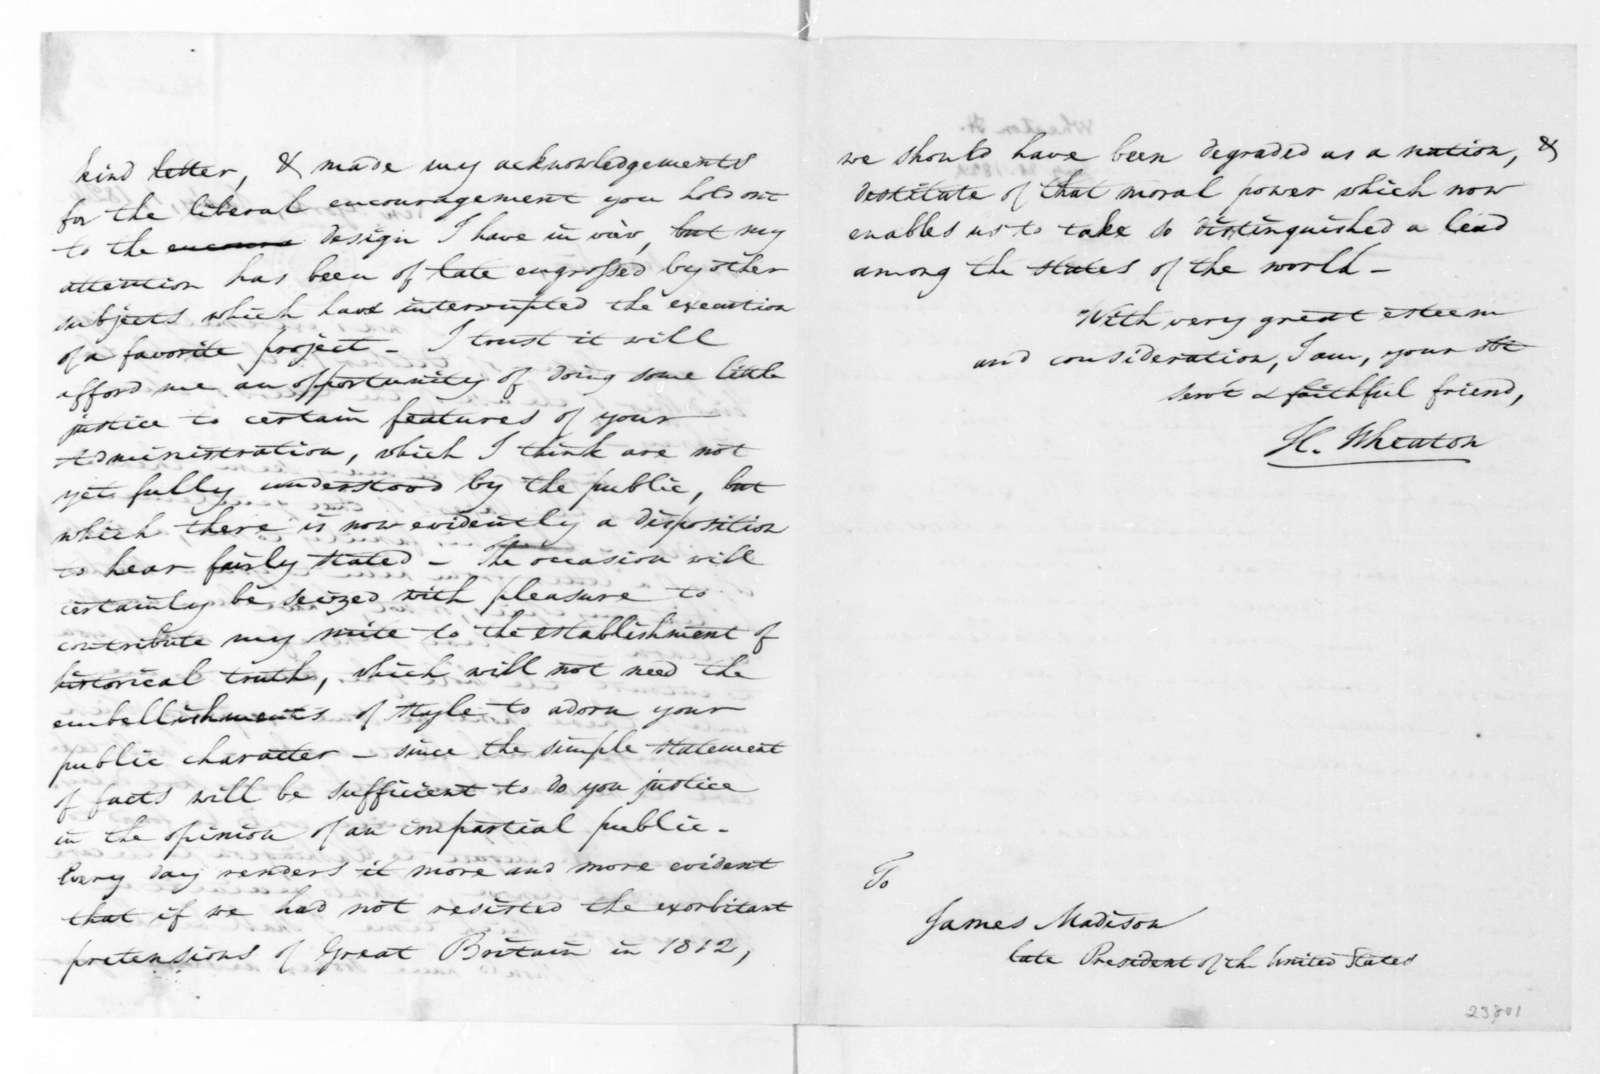 Henry Wheaton to James Madison, January 1, 1824.